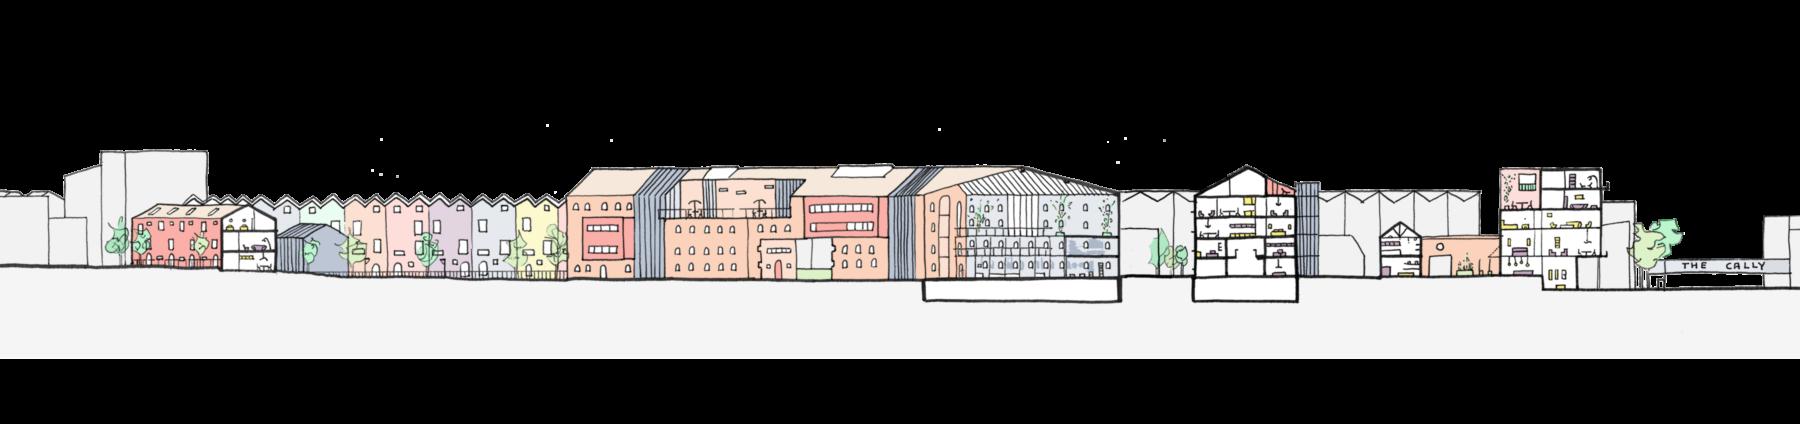 Sarah-Wigglesworth-Architects Unlocking-Pentonville Site-Section-AA Drawing 3600